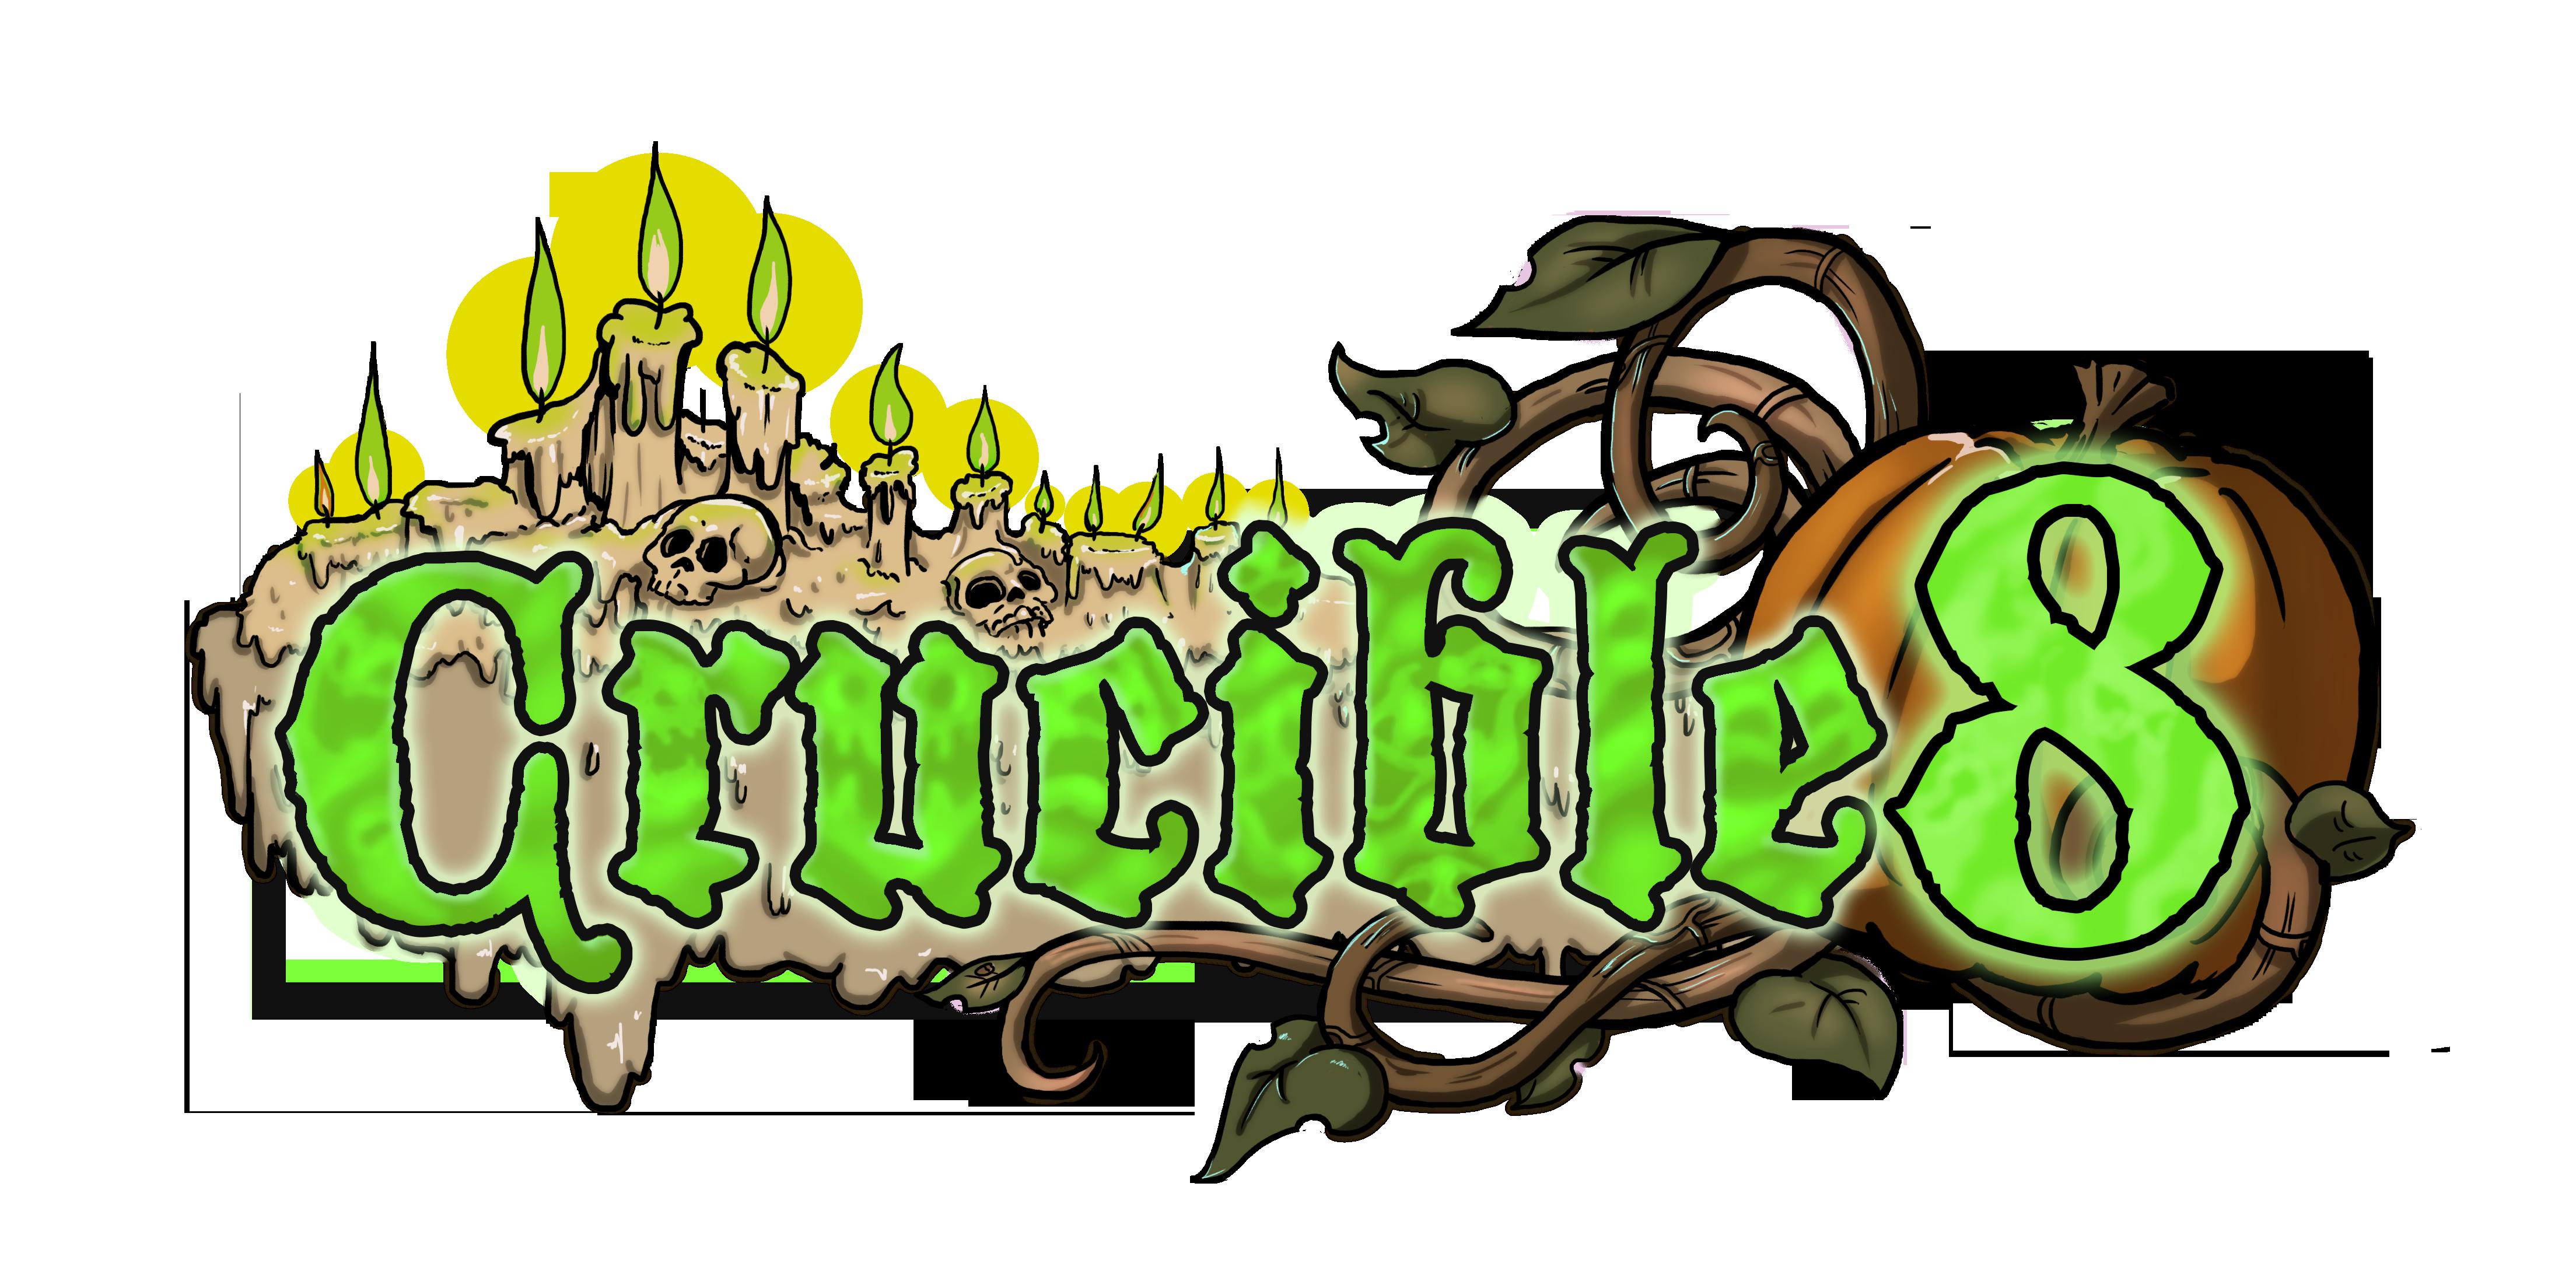 Crucible 8 – Crucible 8